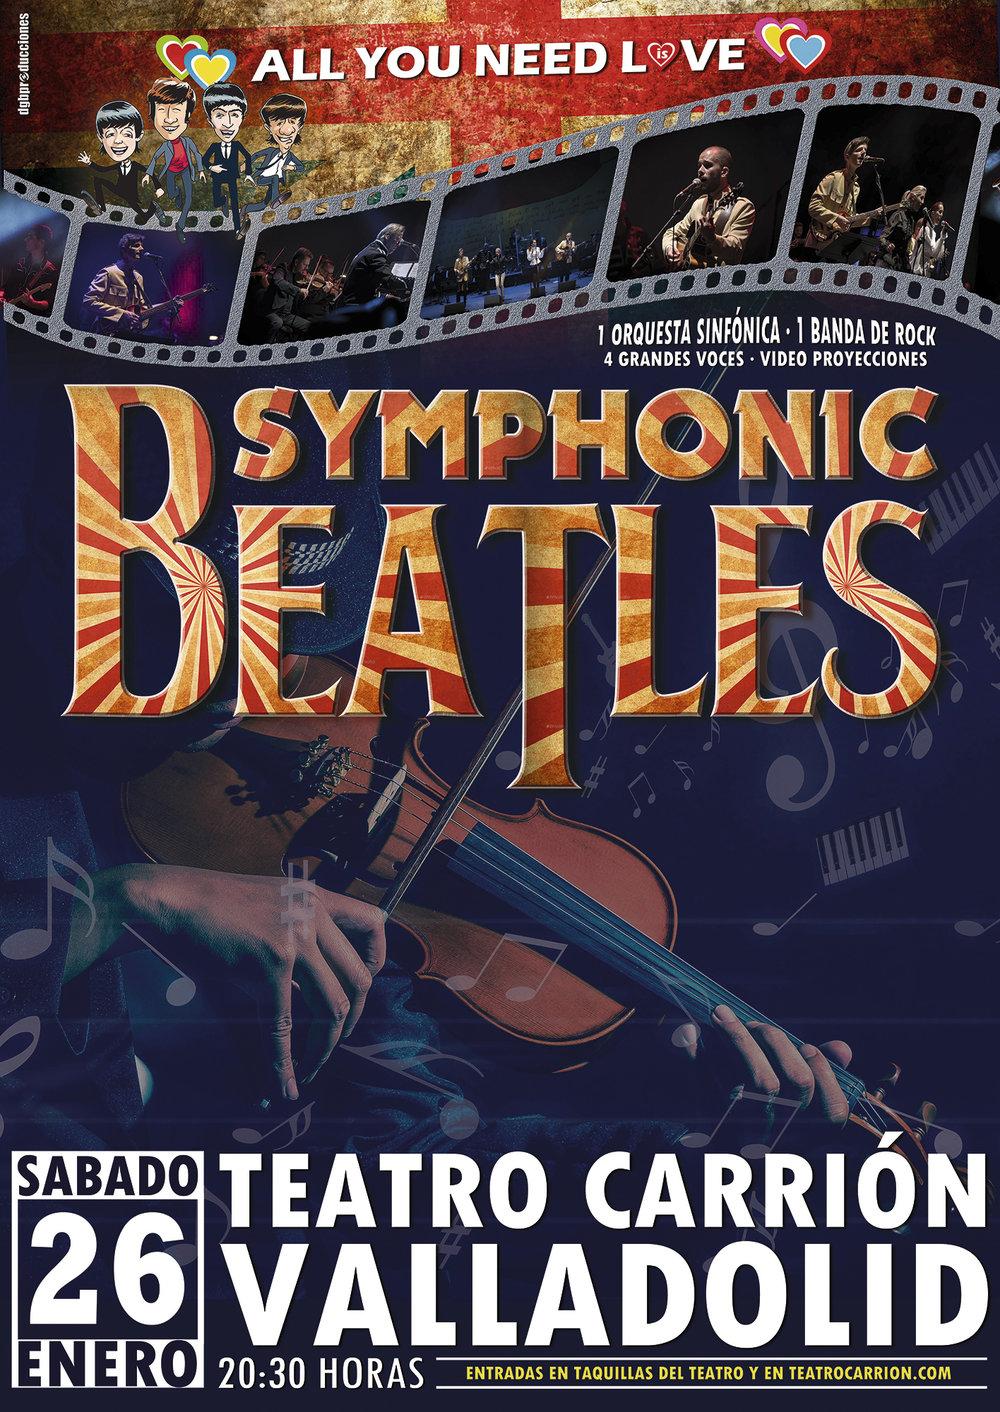 symphonic-beatles-valladolid.jpg